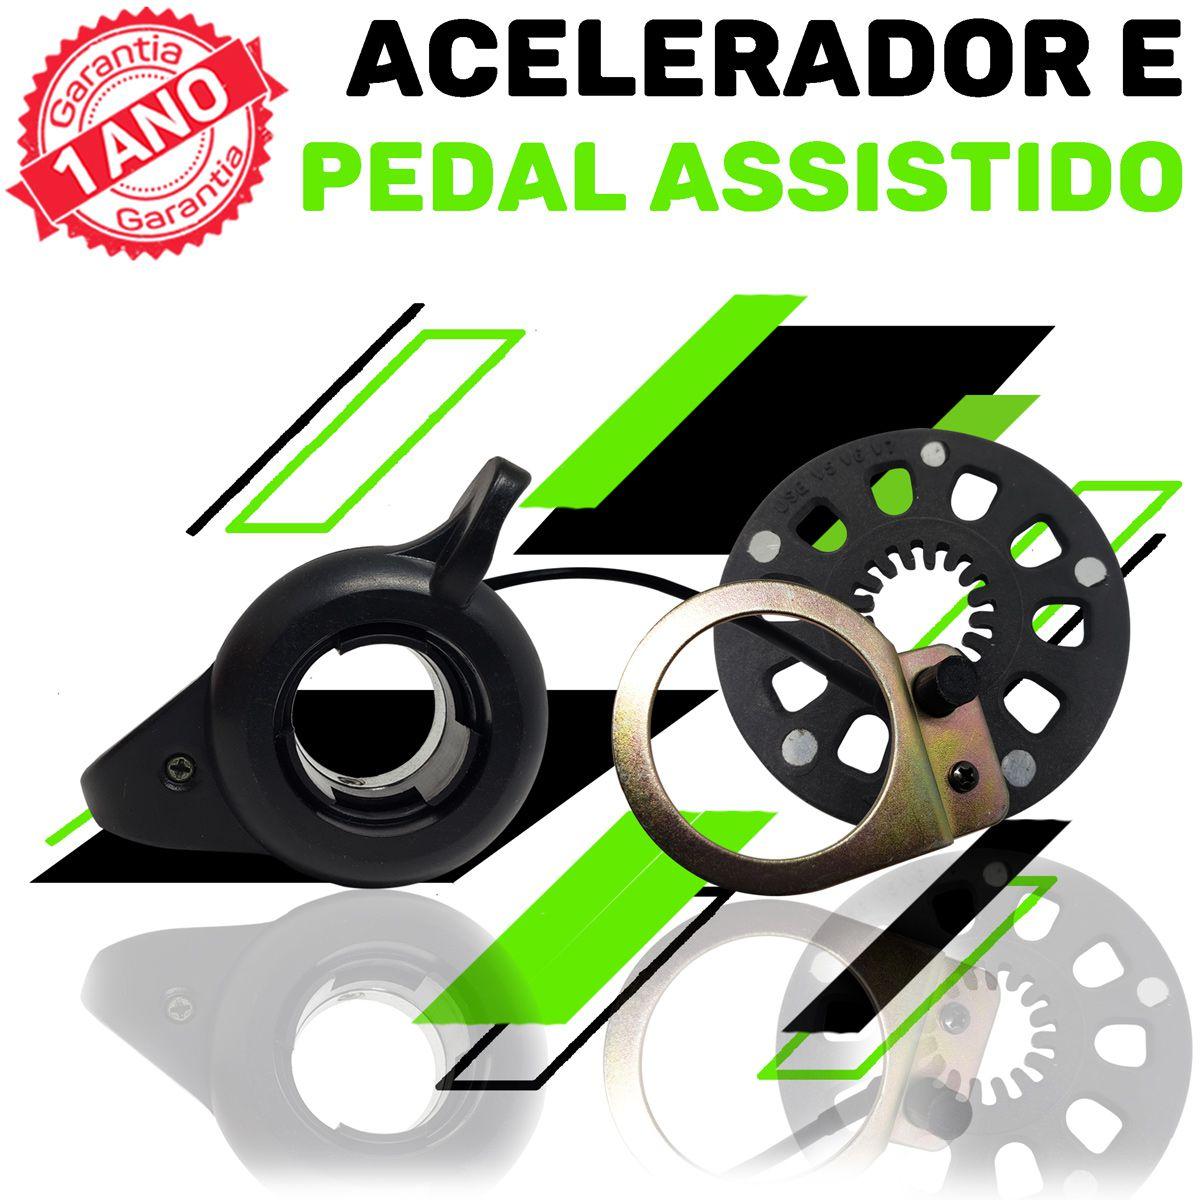 Bicicleta Elétrica Aro 29 AL. BAT. de LITIO TecUltra 3.0 ( + Paralama)